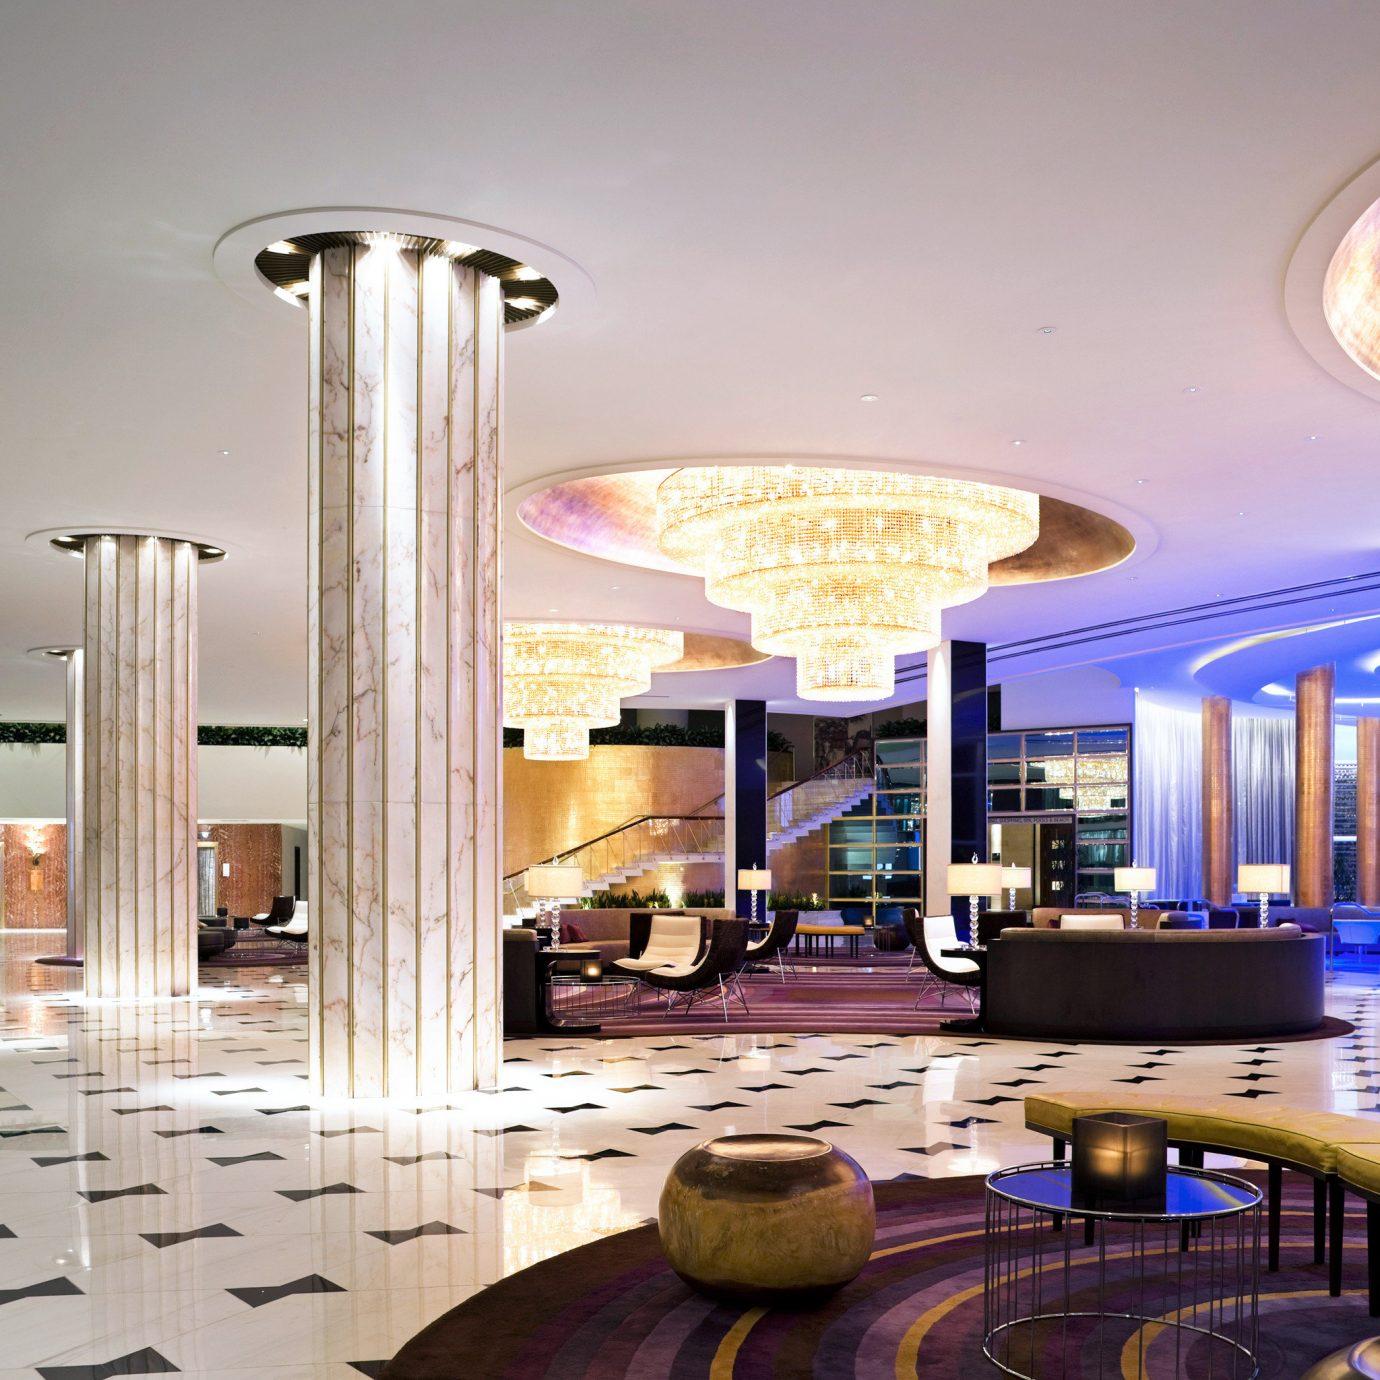 Bar Drink Lobby Lounge Play Pool Resort property condominium lighting mansion convention center